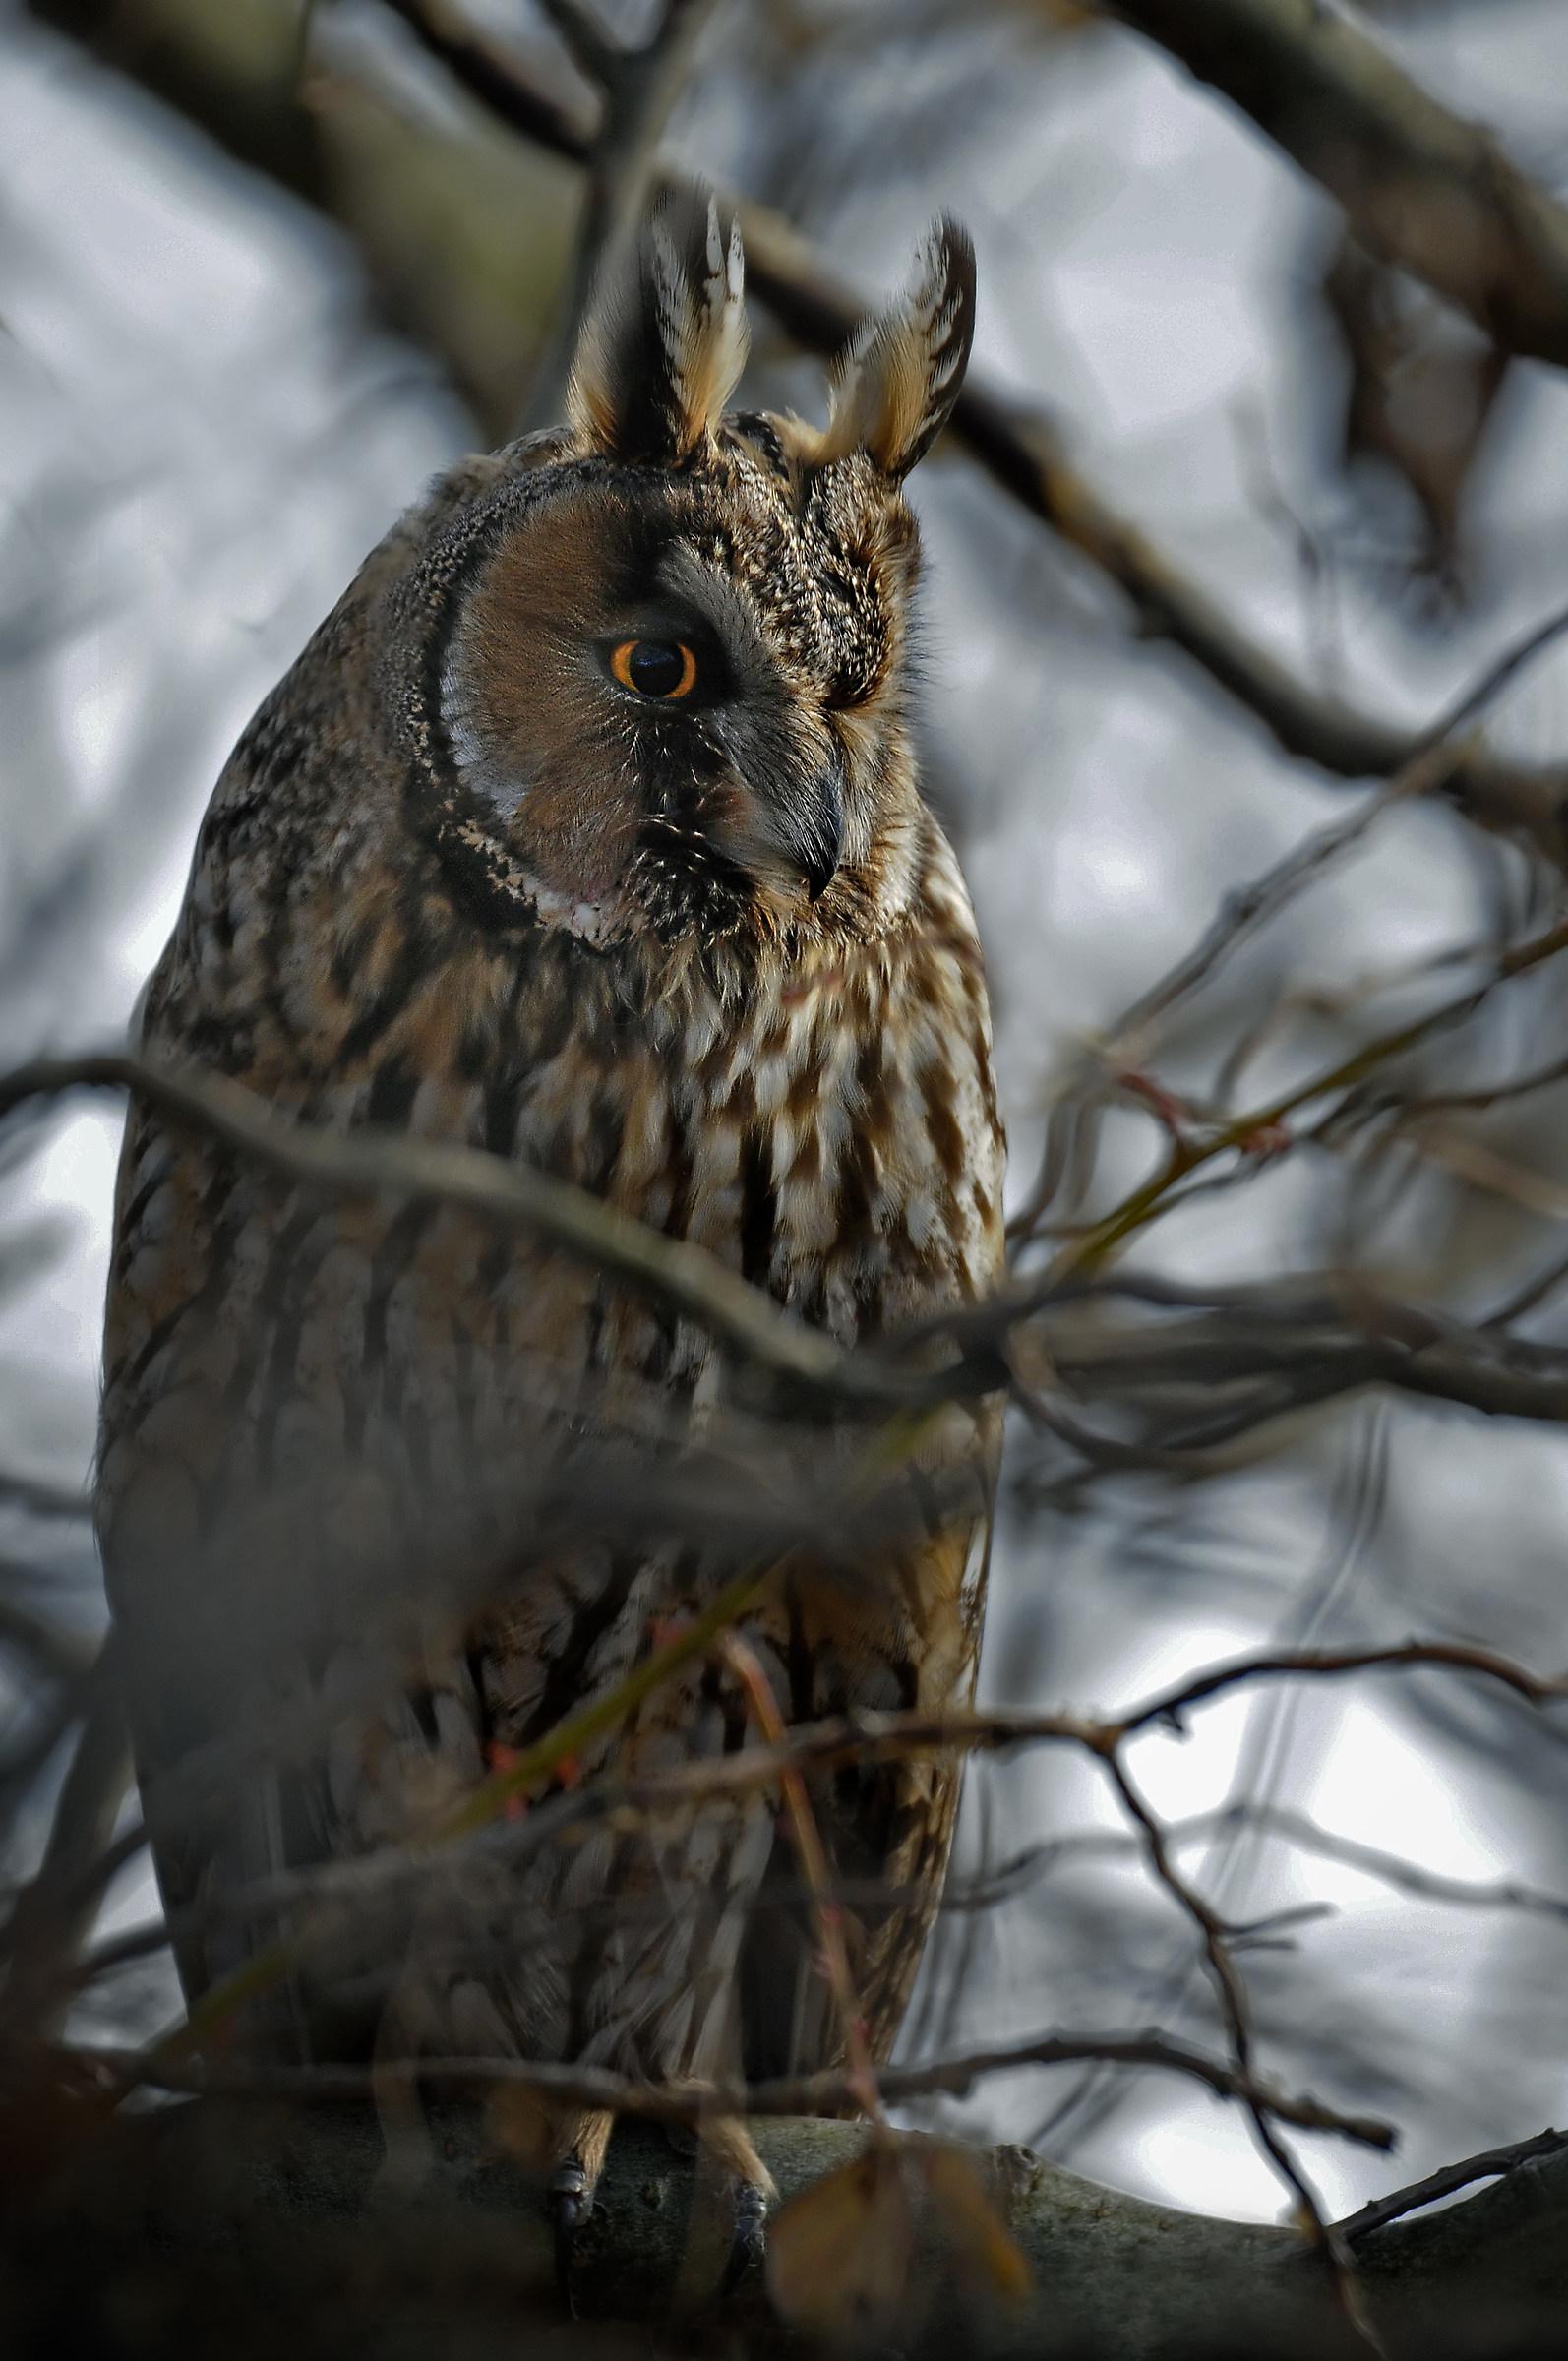 Spirit of the night - Owl...